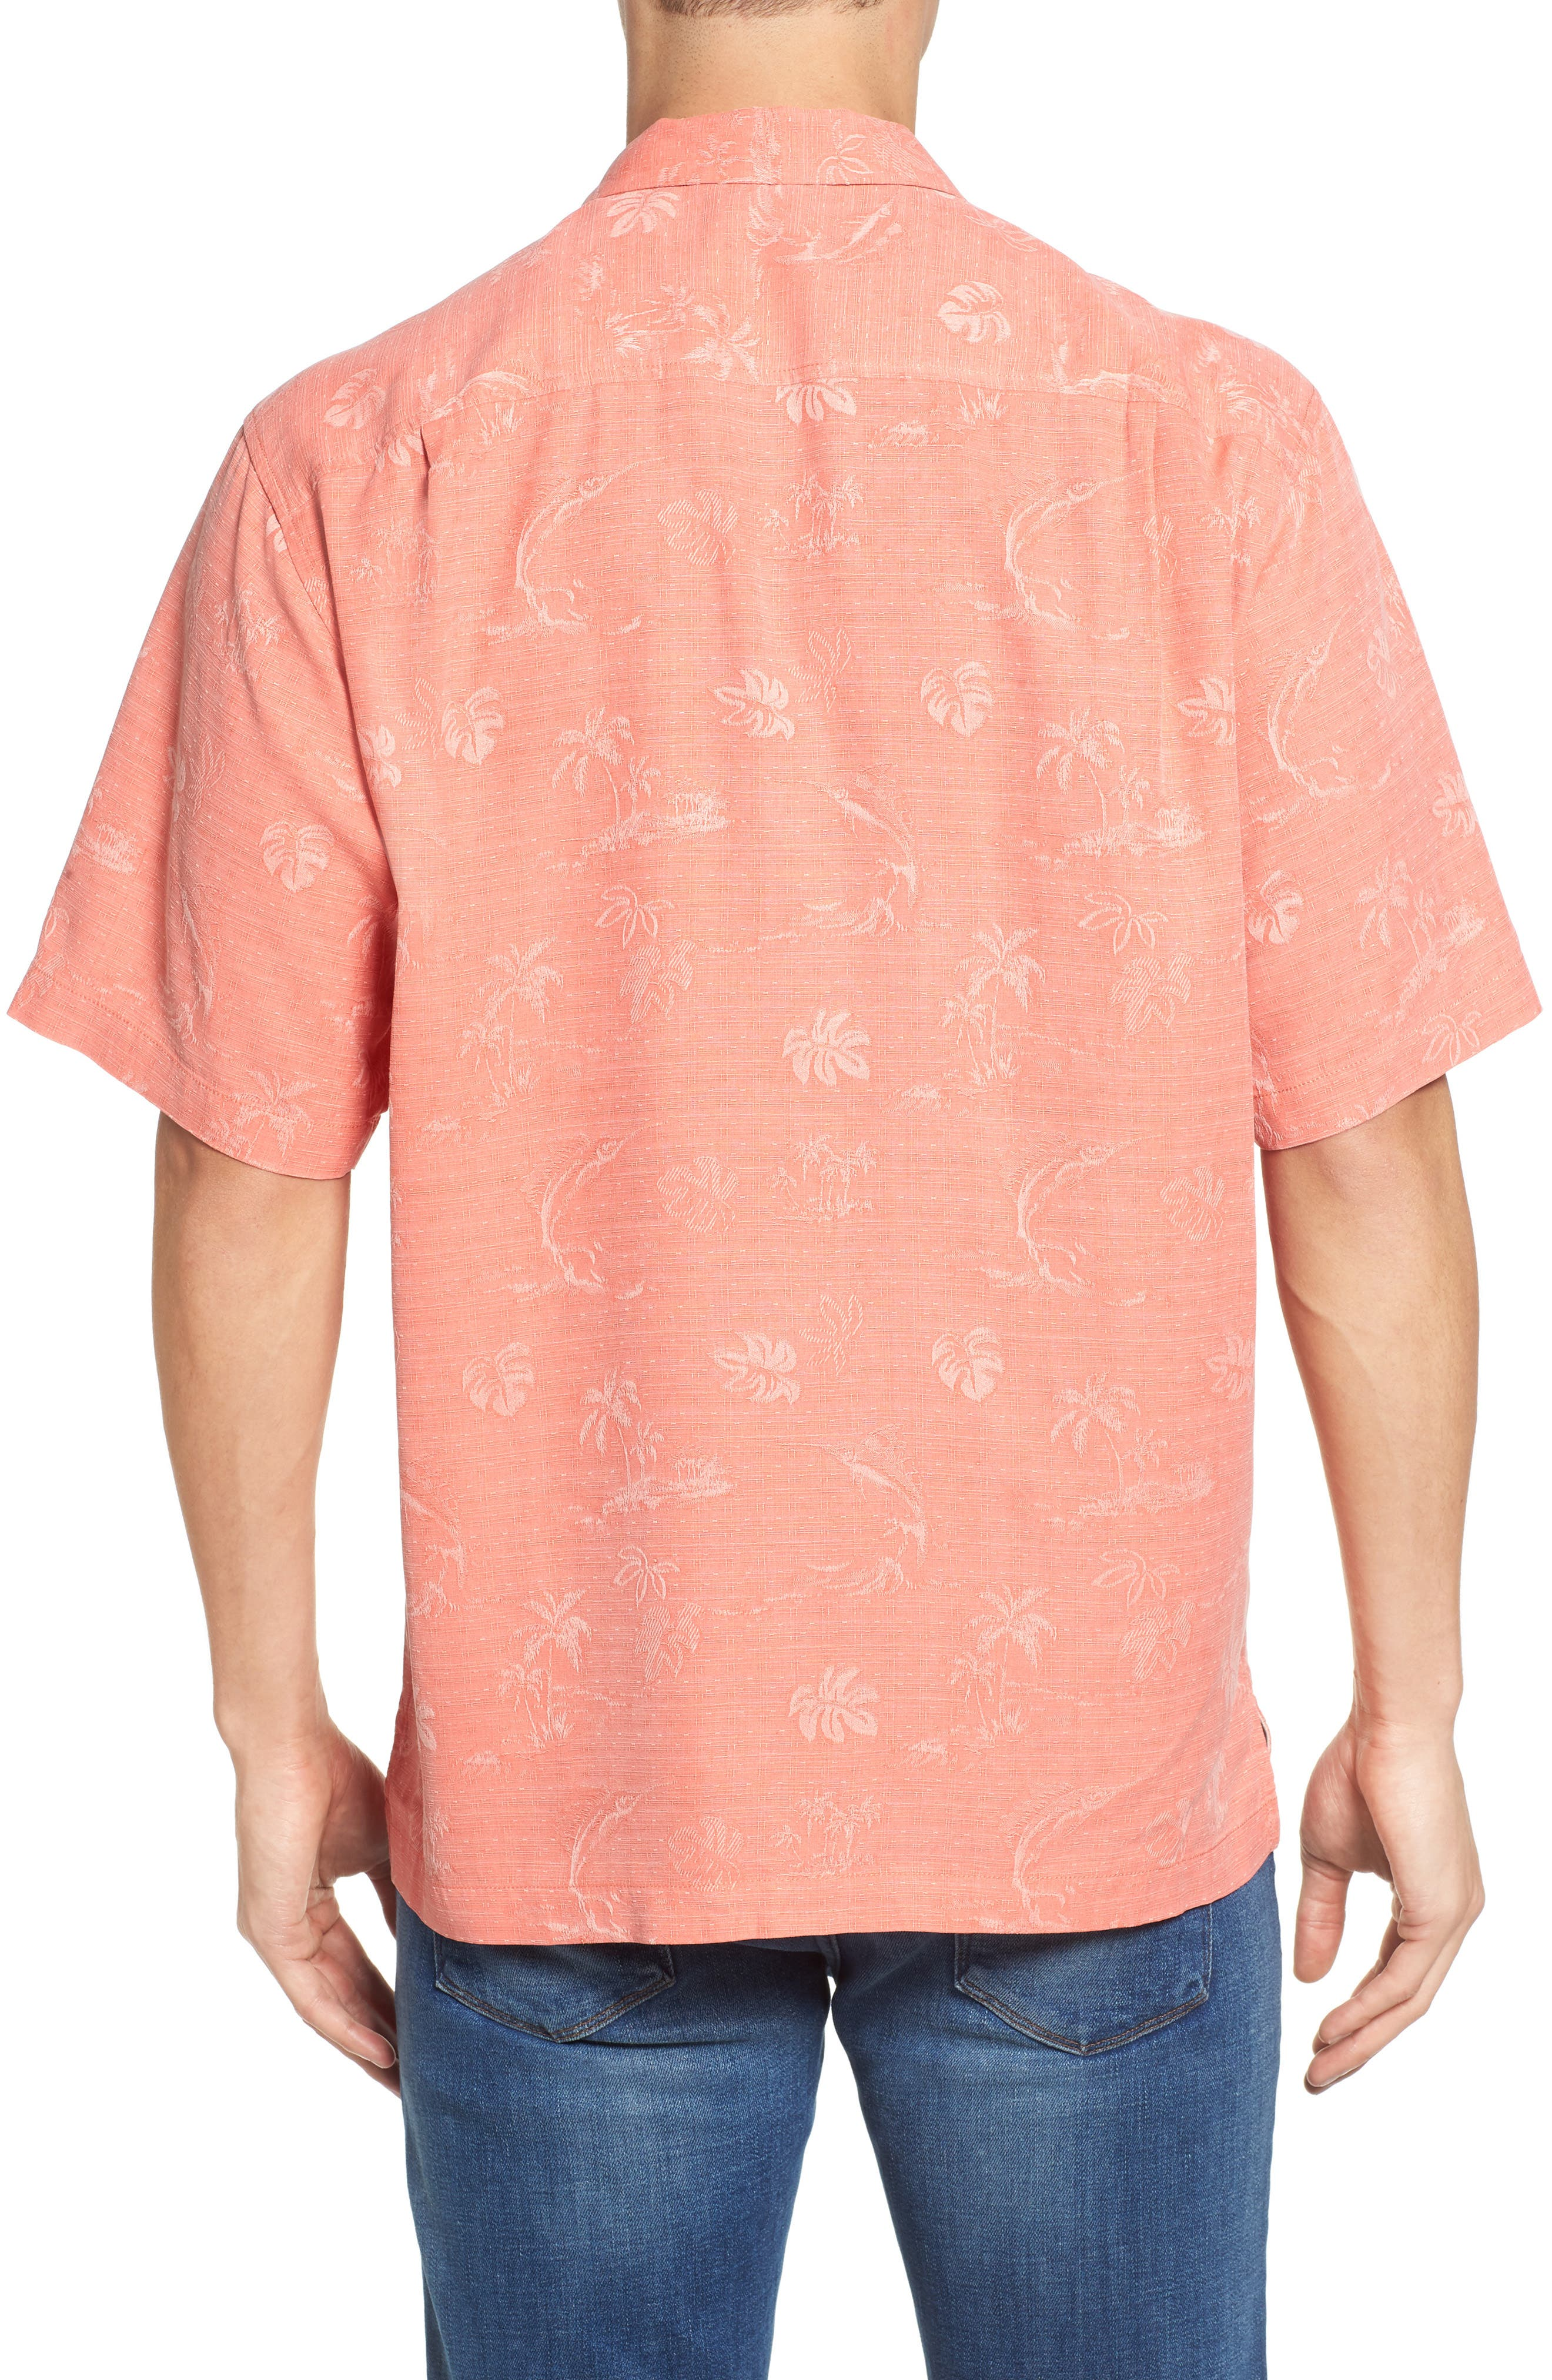 Gulf Shore Marlin Silk Camp Shirt,                             Alternate thumbnail 10, color,